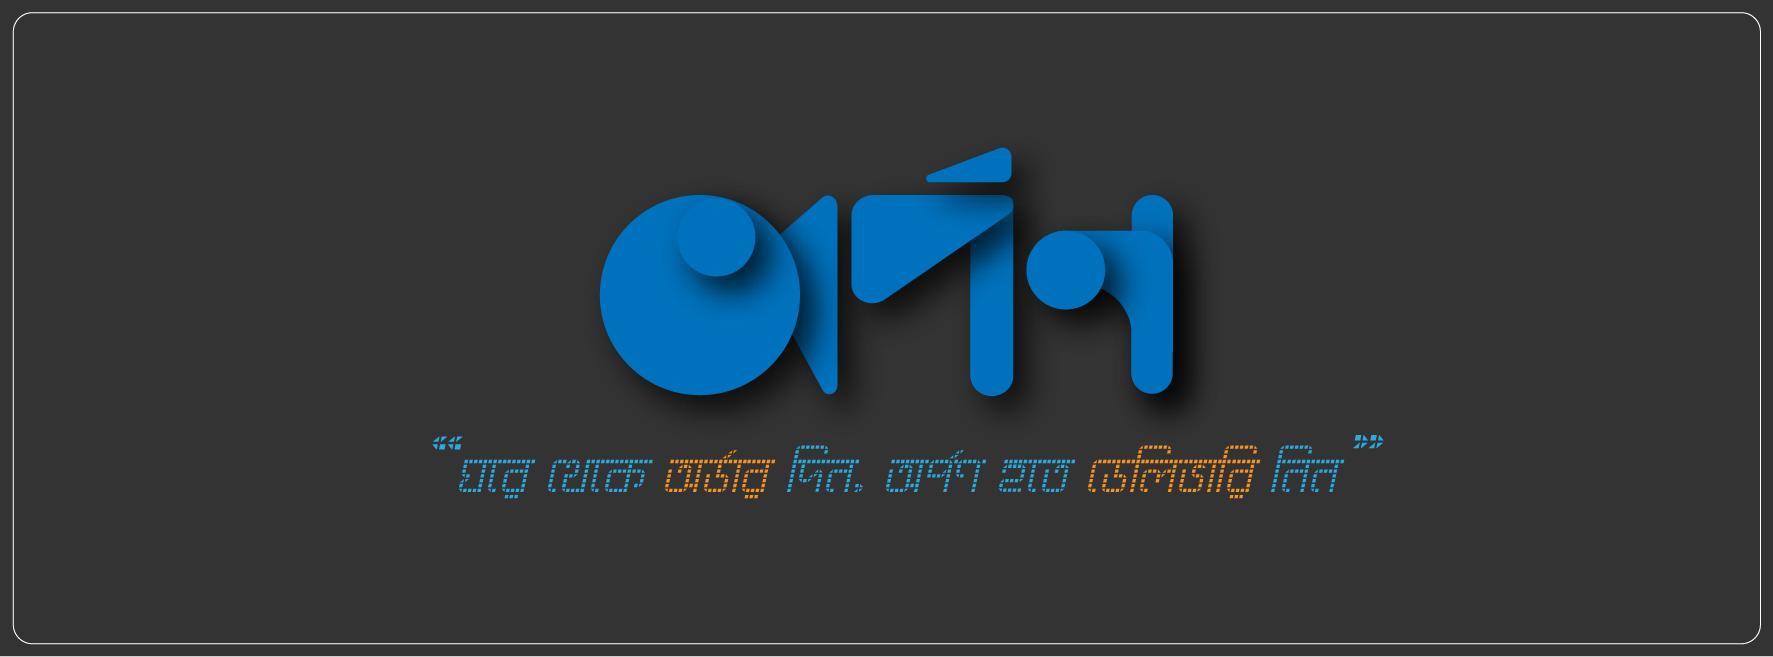 Arpan's banner photo (3)